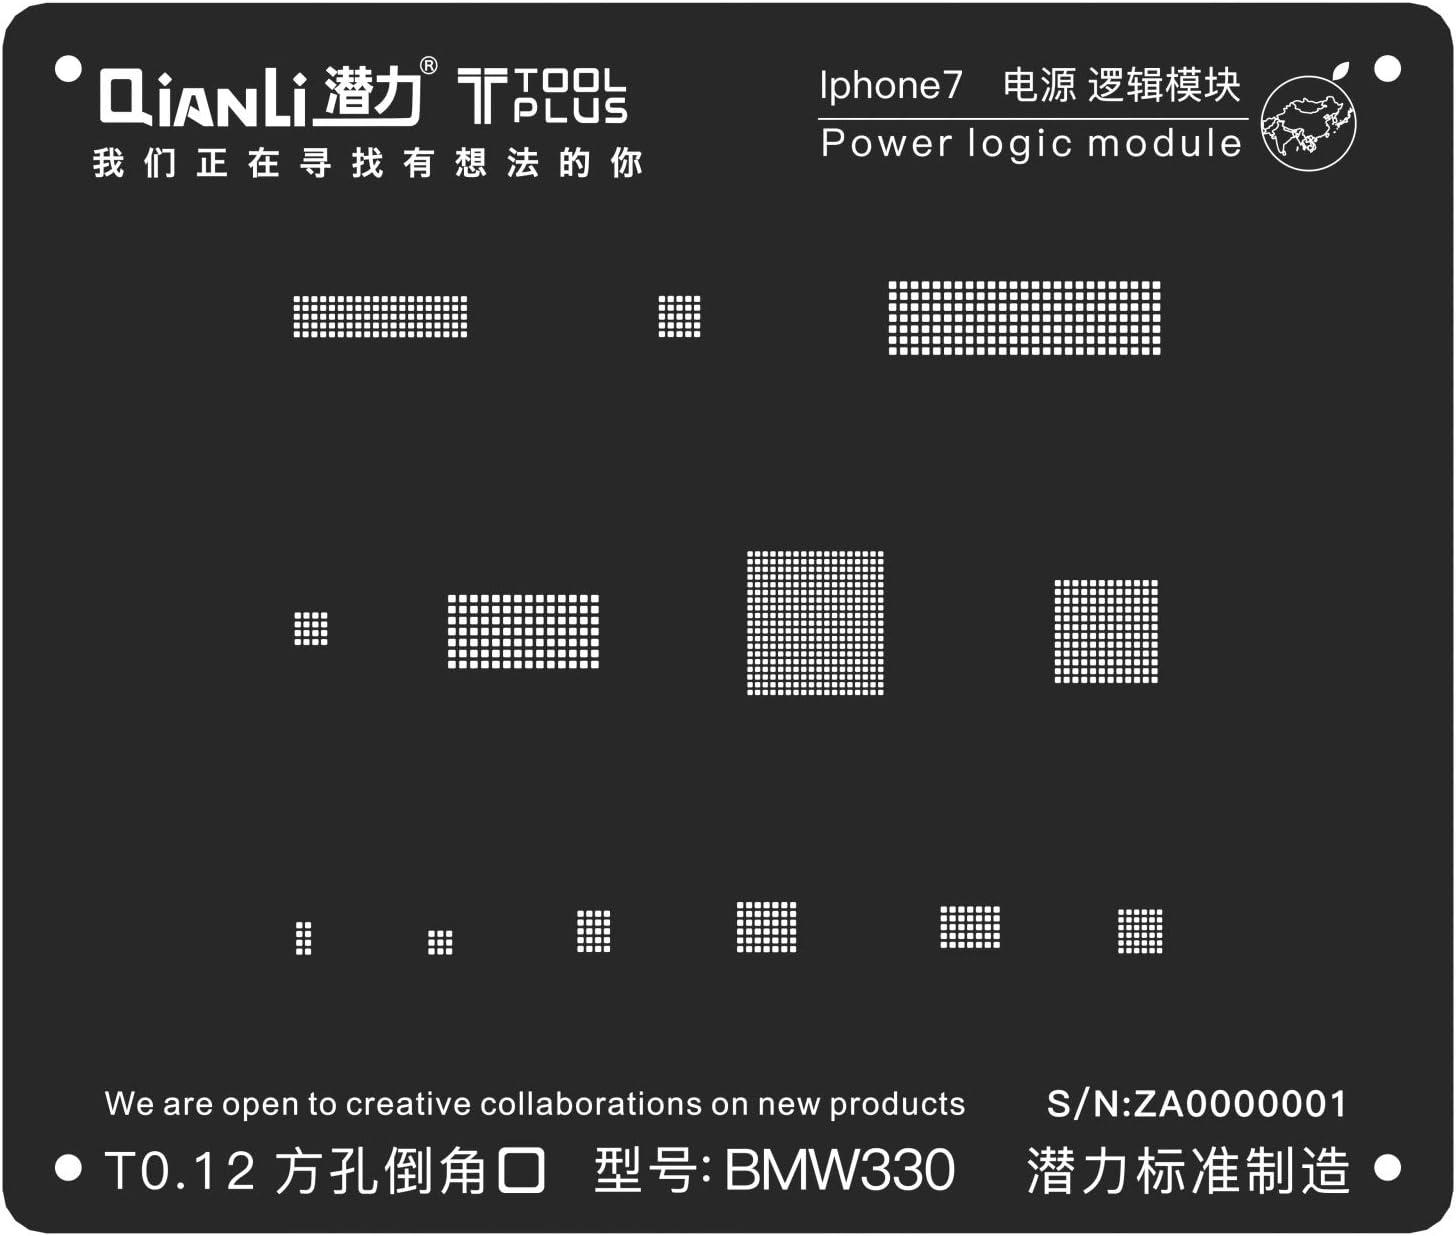 QianLi ToolPlus 3D iBlack Stencil for iPhone 6s Power Logic Module